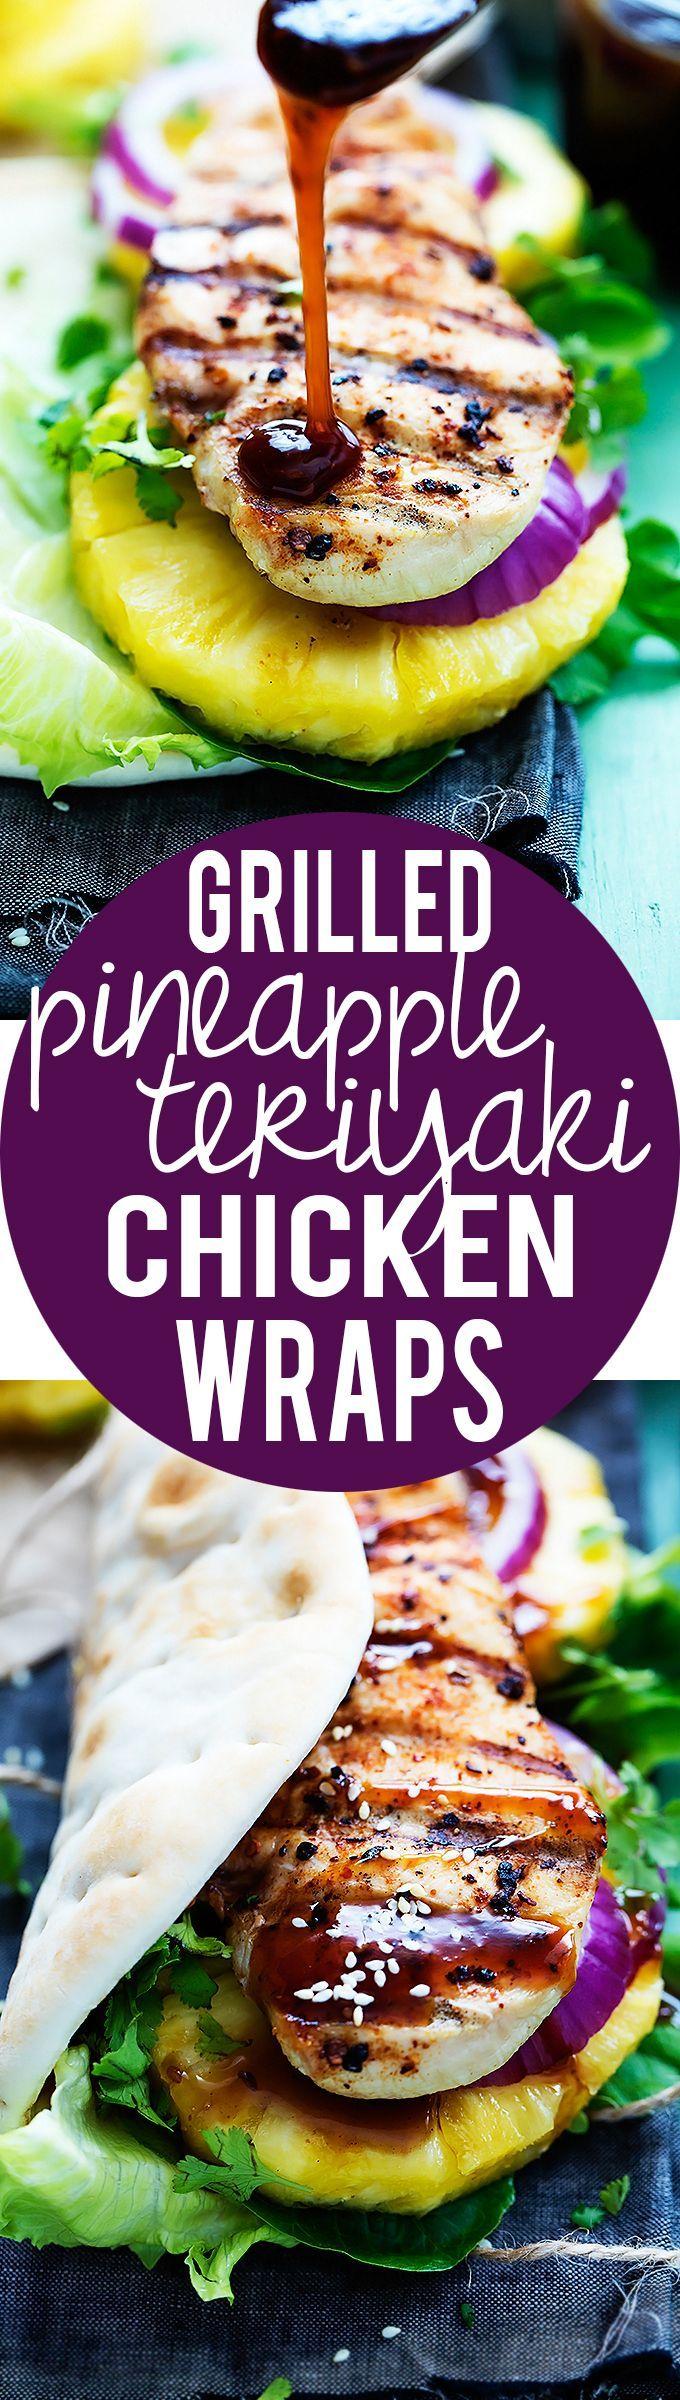 Grilled Pineapple Chicken Teriyaki Wraps   Creme de la Crumb